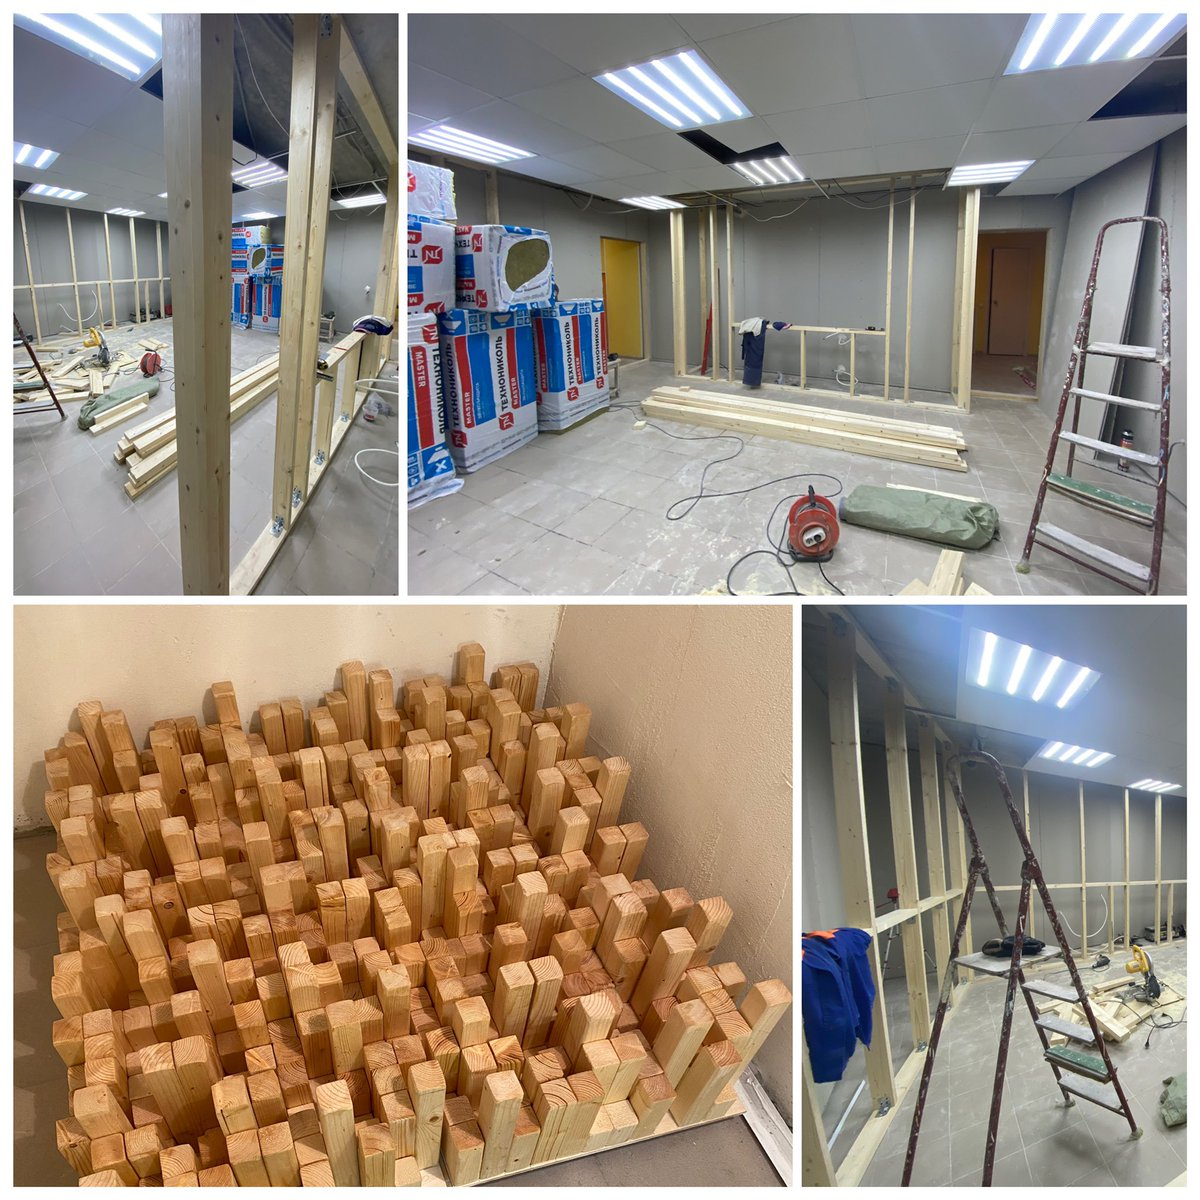 Control room building process #protools #nuendo #foleystudio #postproduction #filmmaking #audiopost #foley #audiopostproduction #sounddesign #foleyartist #foleyfirst #soundediting